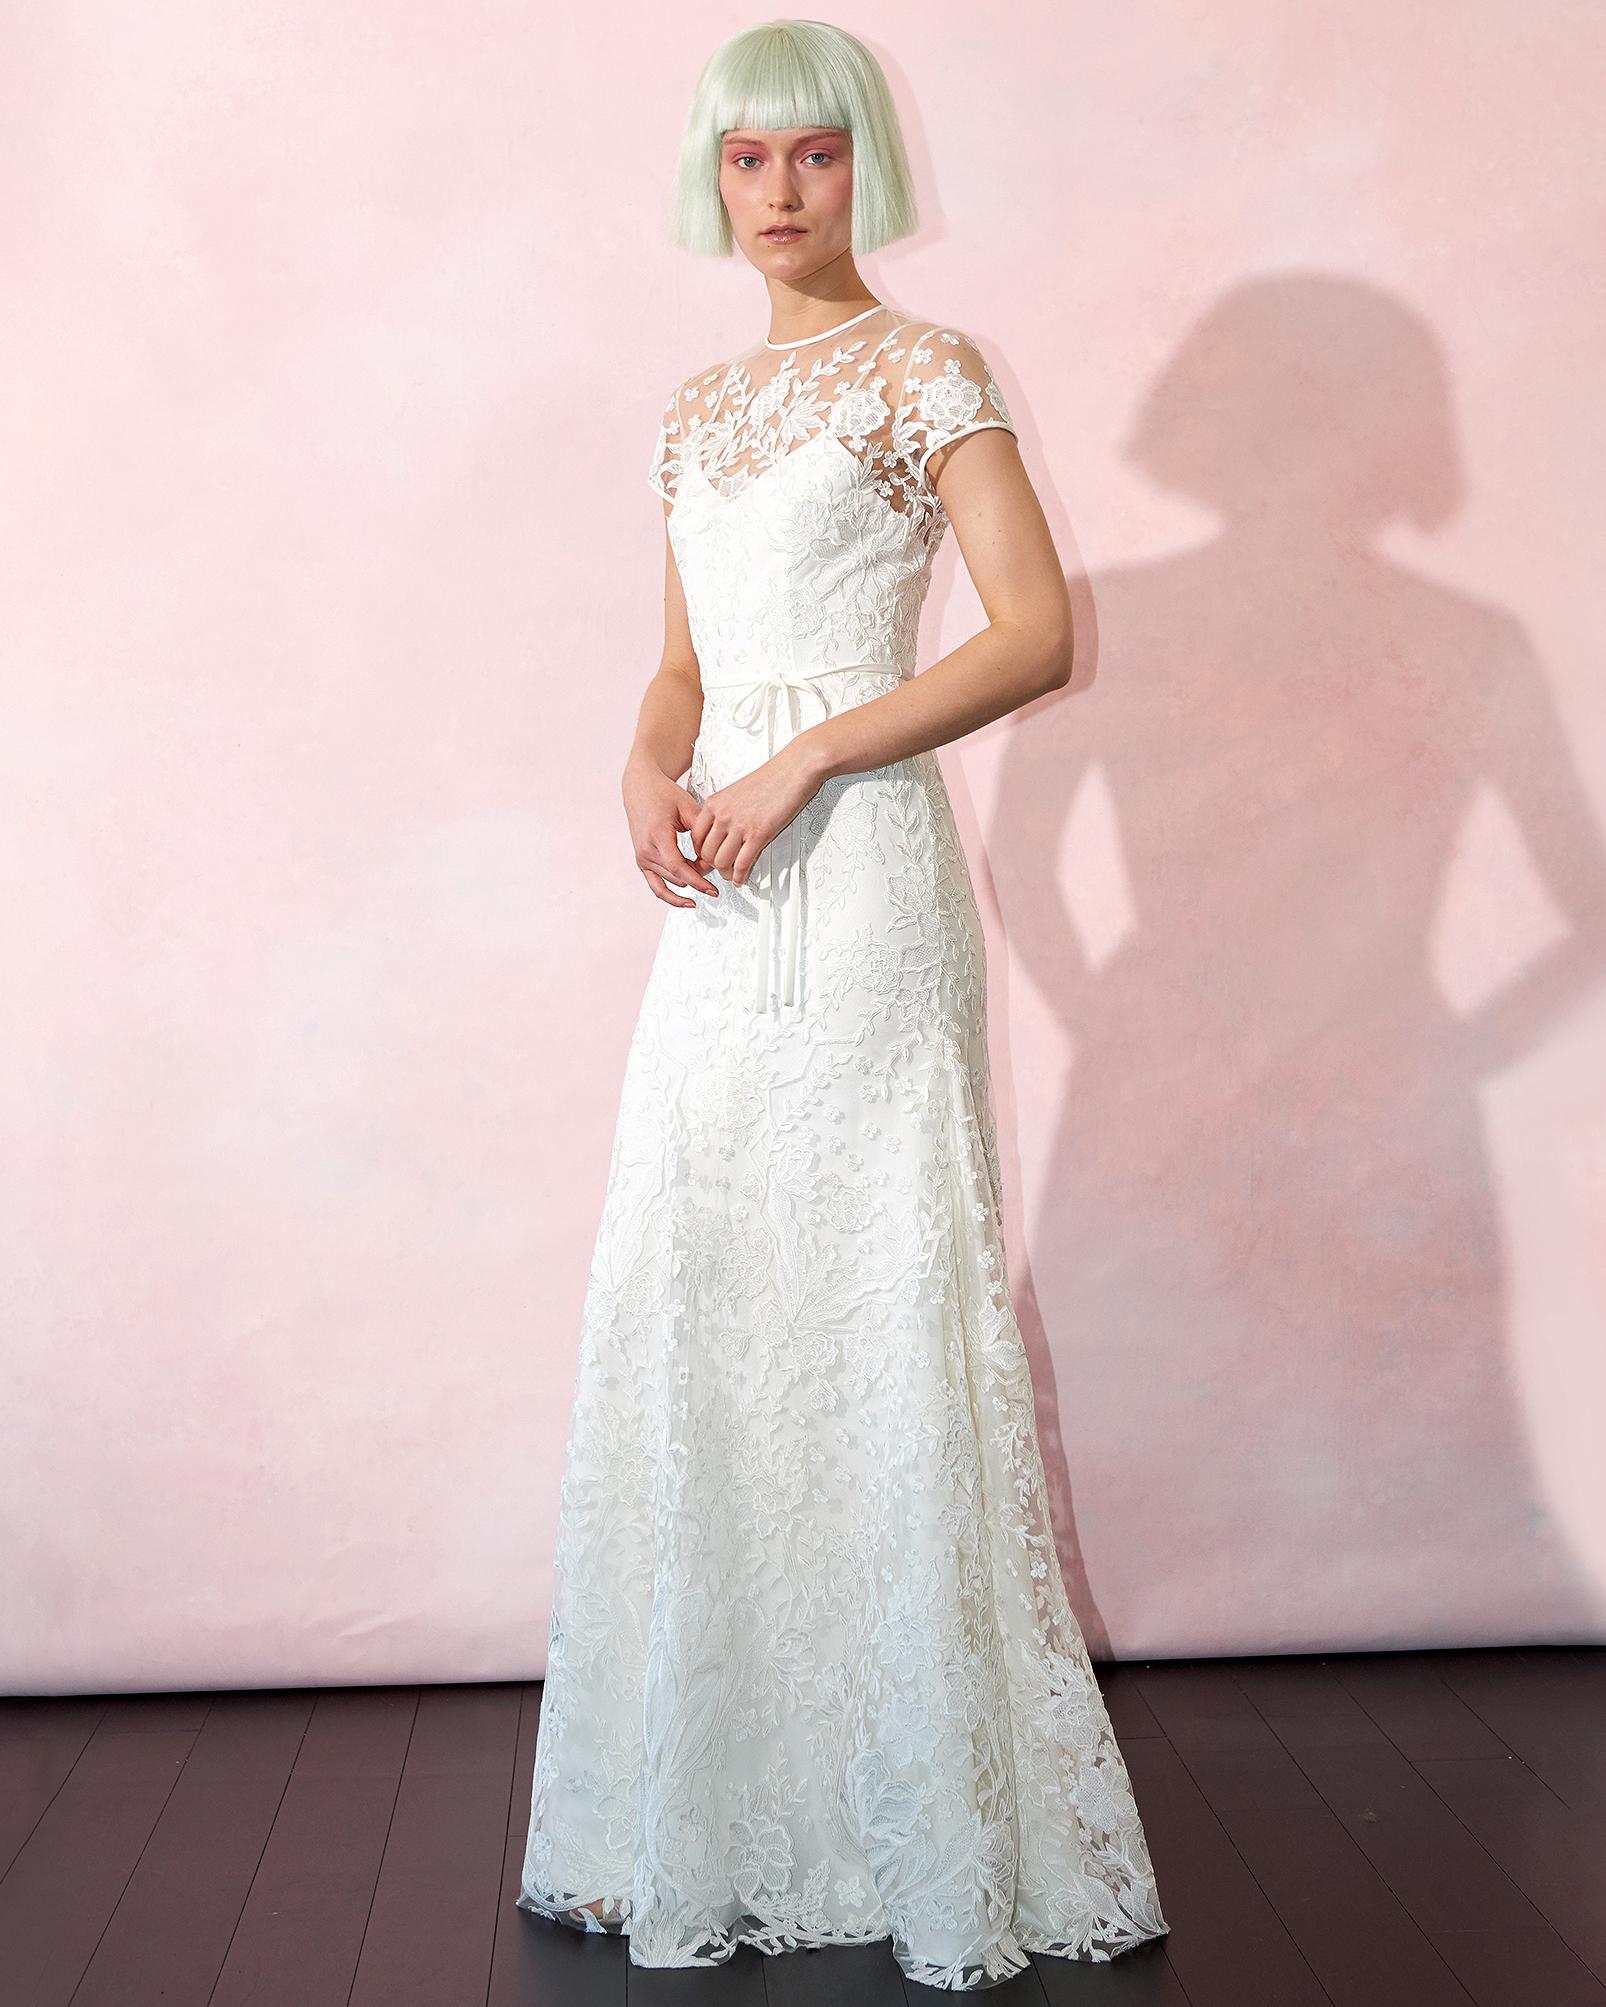 isabelle armstrong wedding dress spring 2019 short-sleeve illusion neck sheath